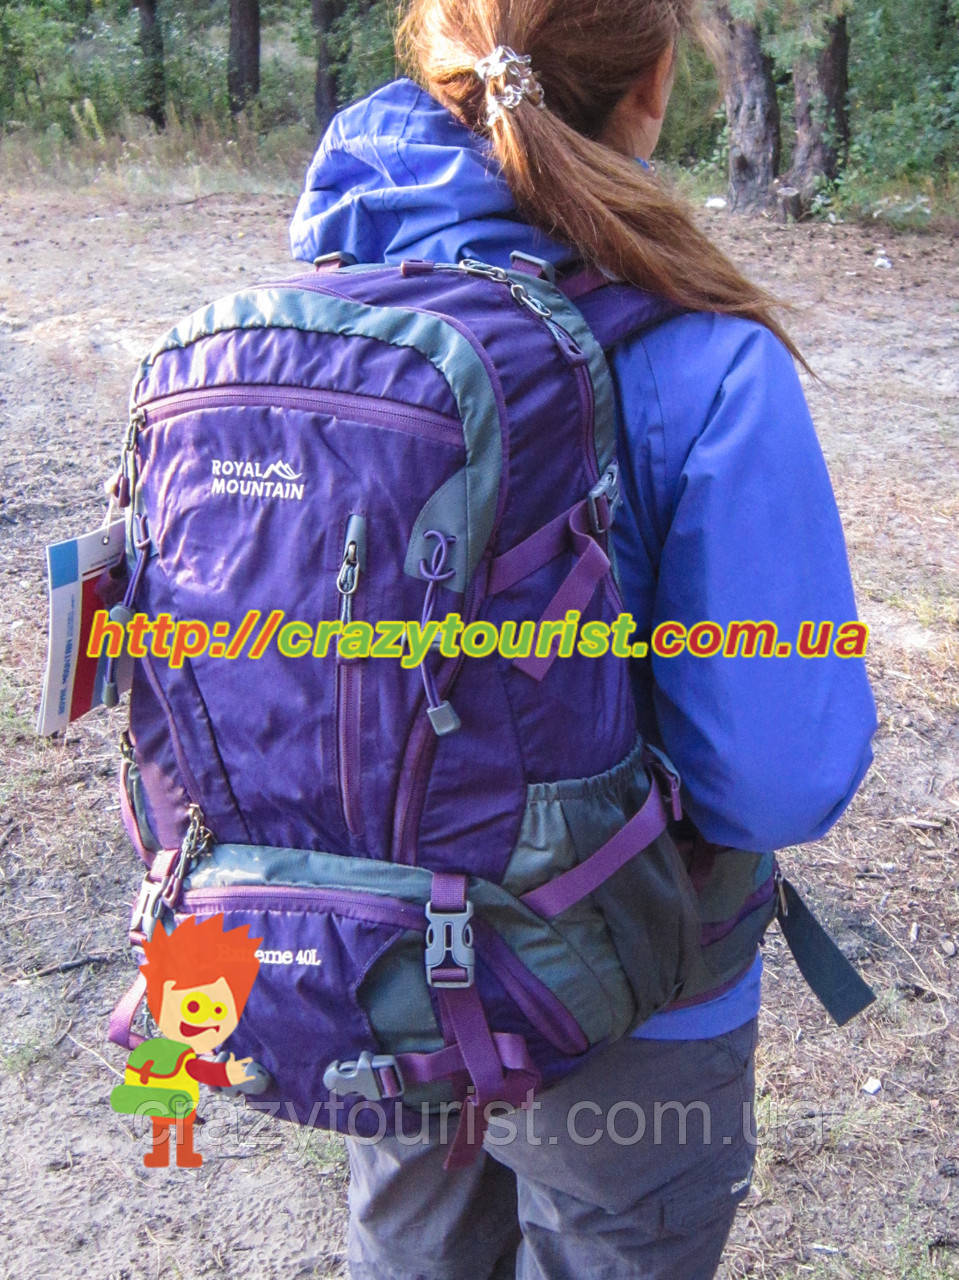 "Рюкзак Royal Mountain 8421 40 L Purple - Интернет-магазин ""Crazy Tourist"" в Днепре"